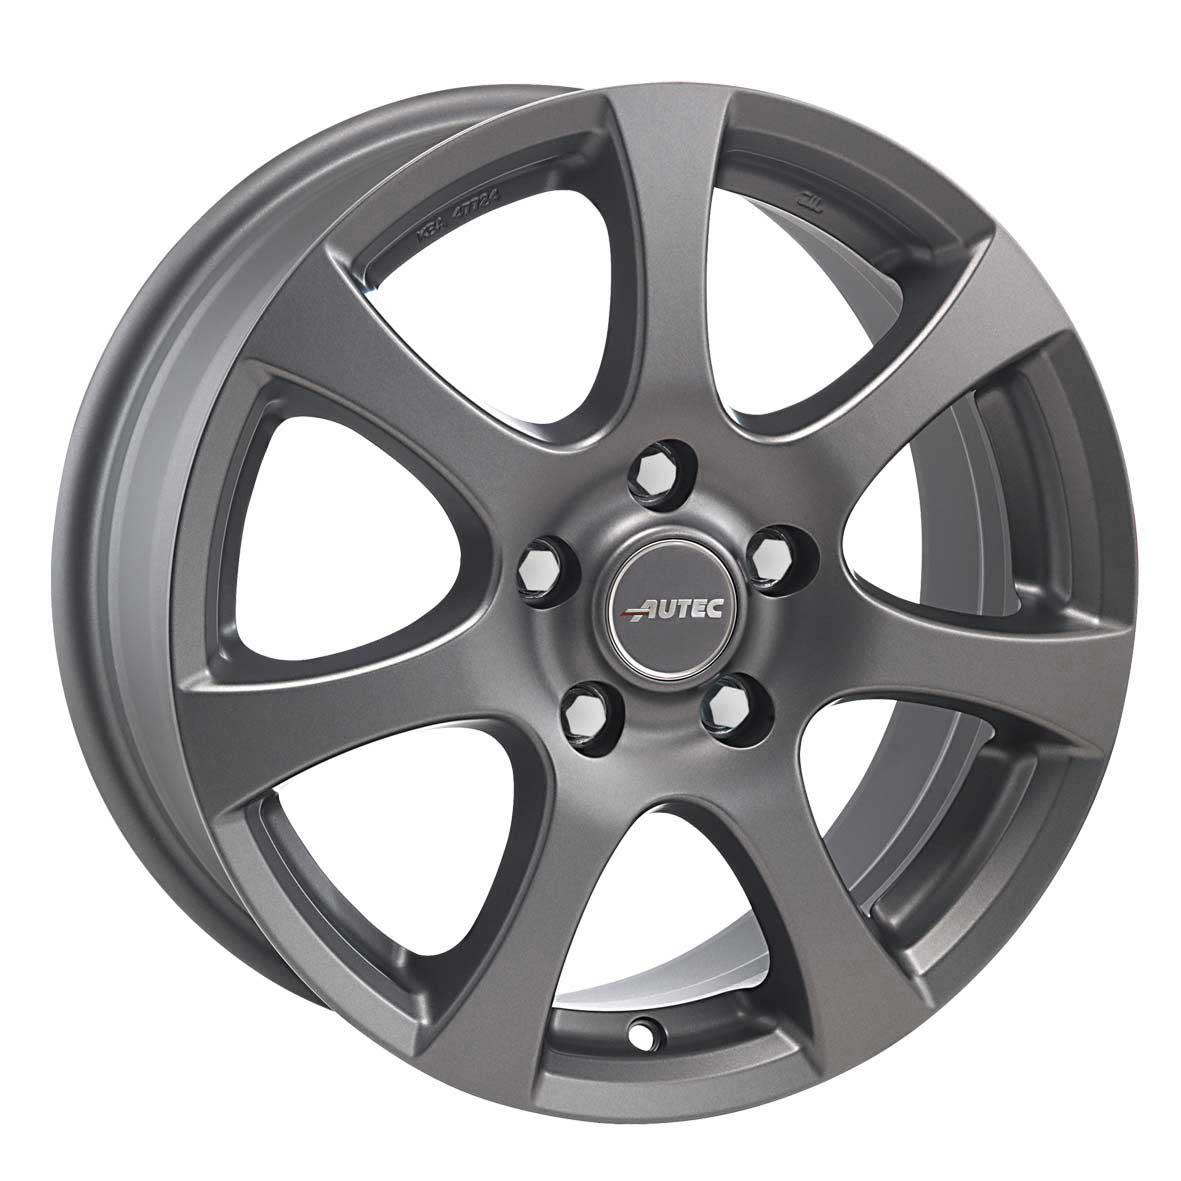 autec wheels zenit et43 5x112 for mercedes benz a b. Black Bedroom Furniture Sets. Home Design Ideas